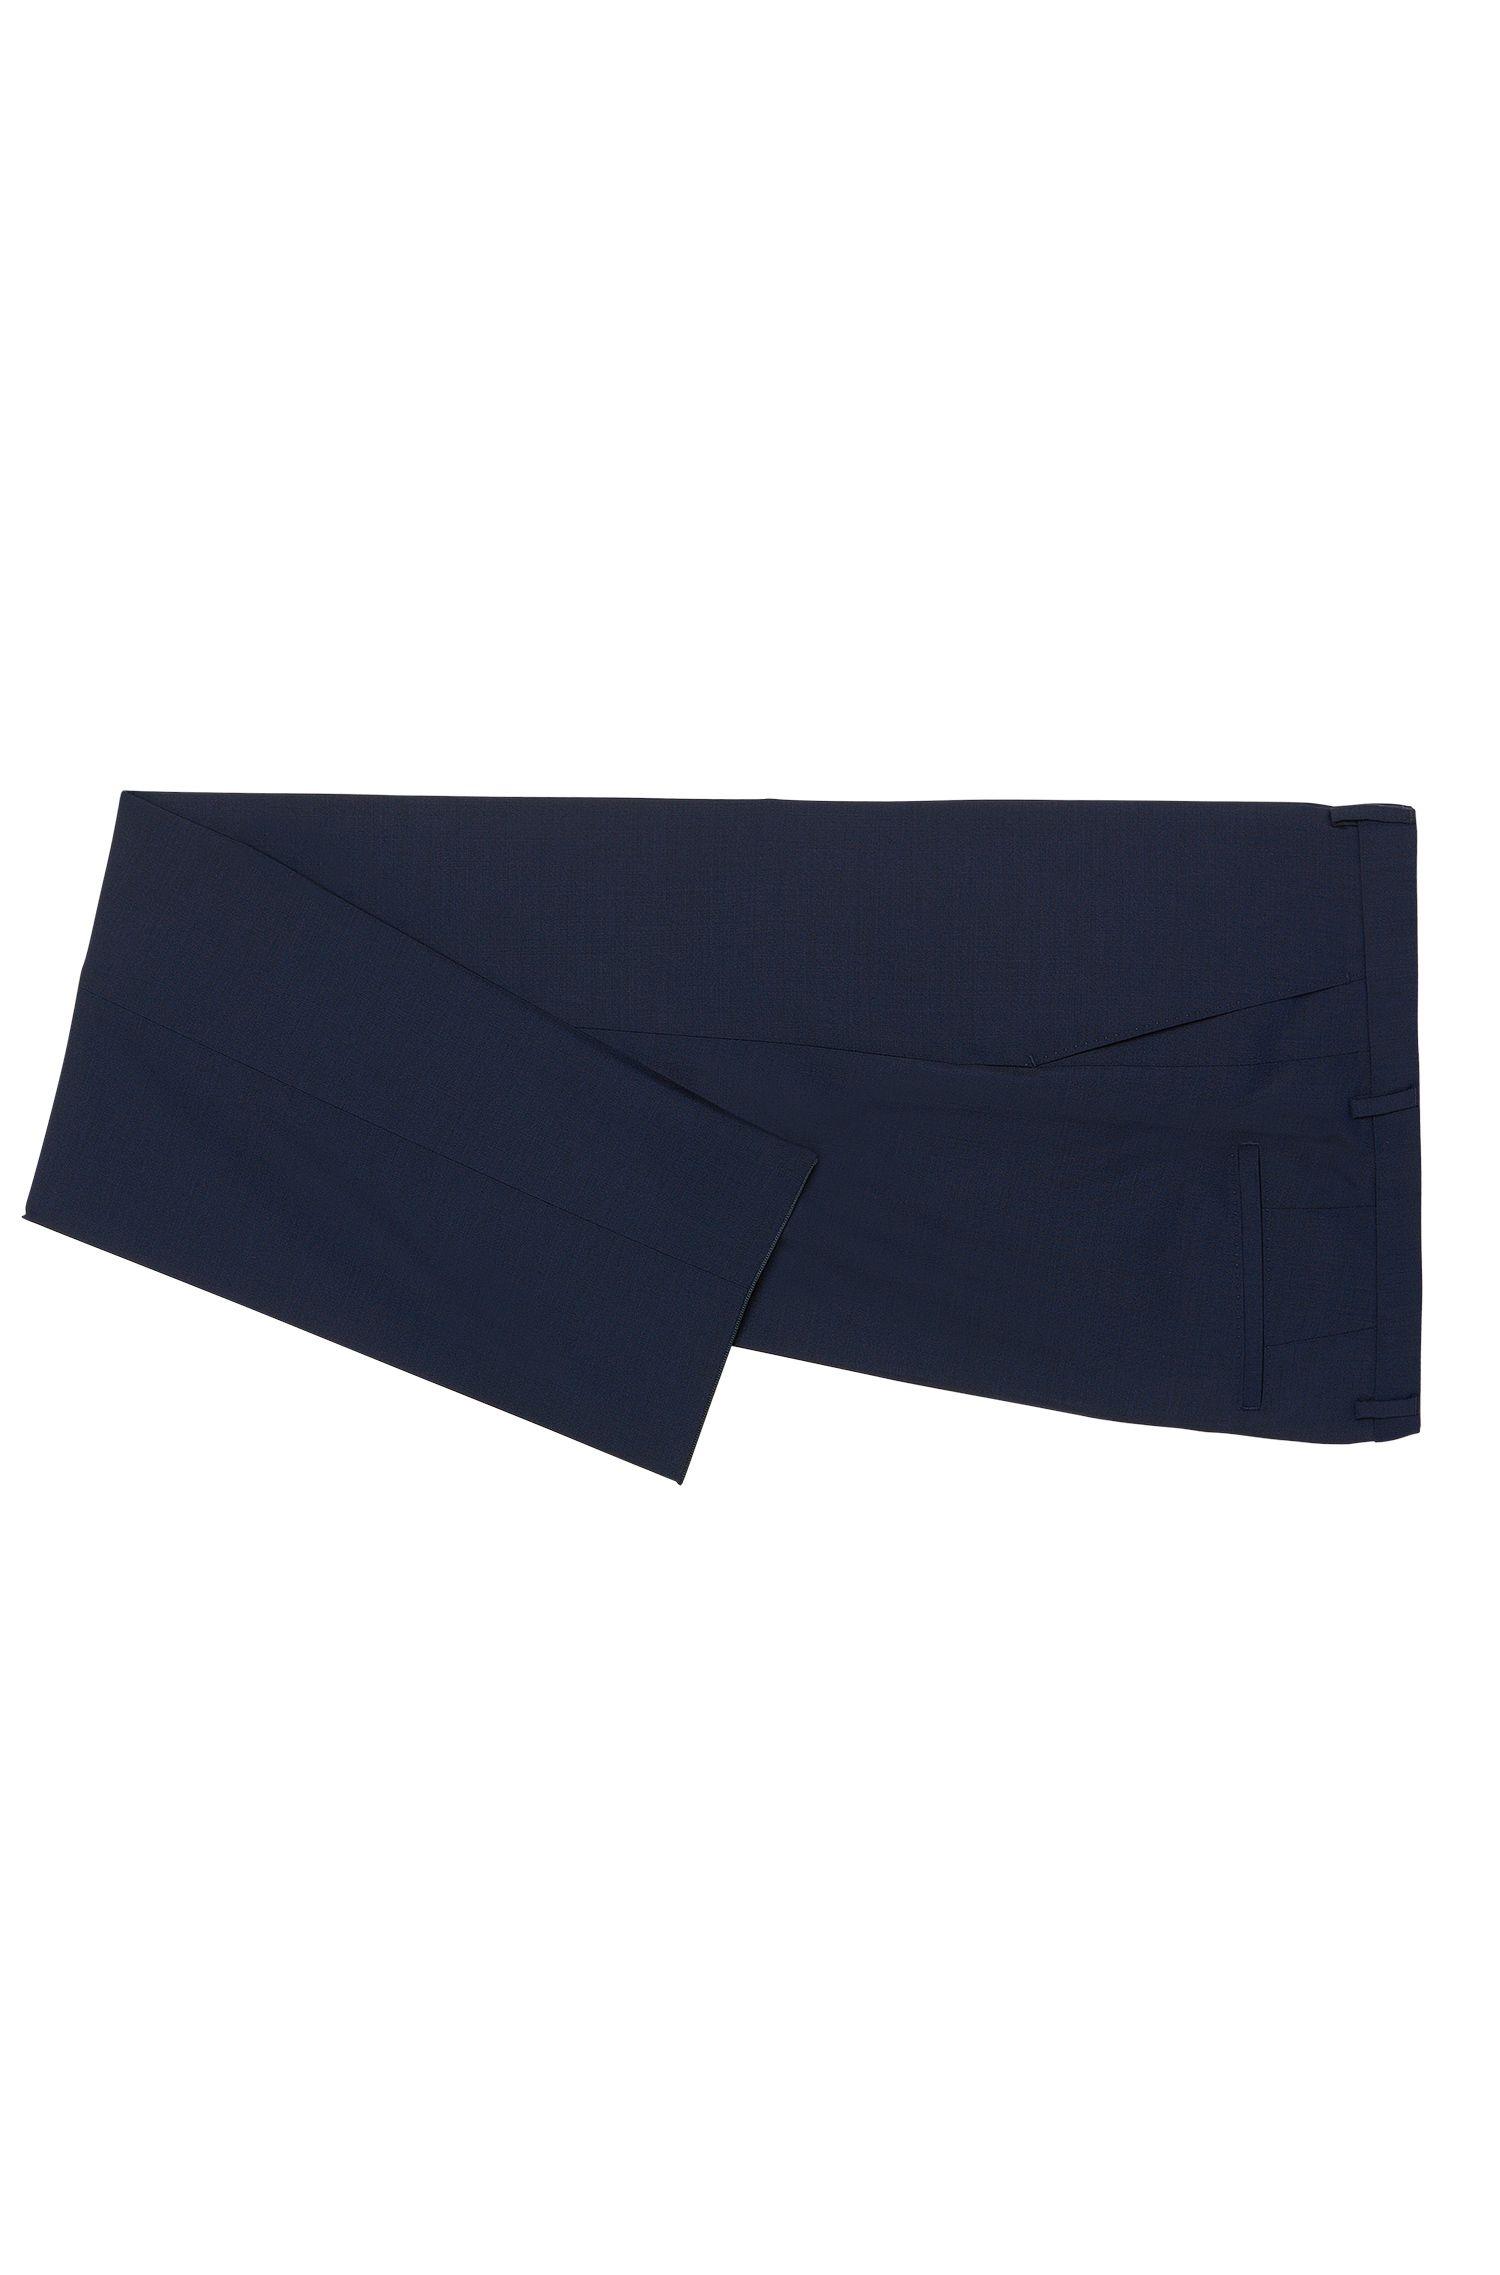 Costume Regular Fit en laine vierge , Bleu